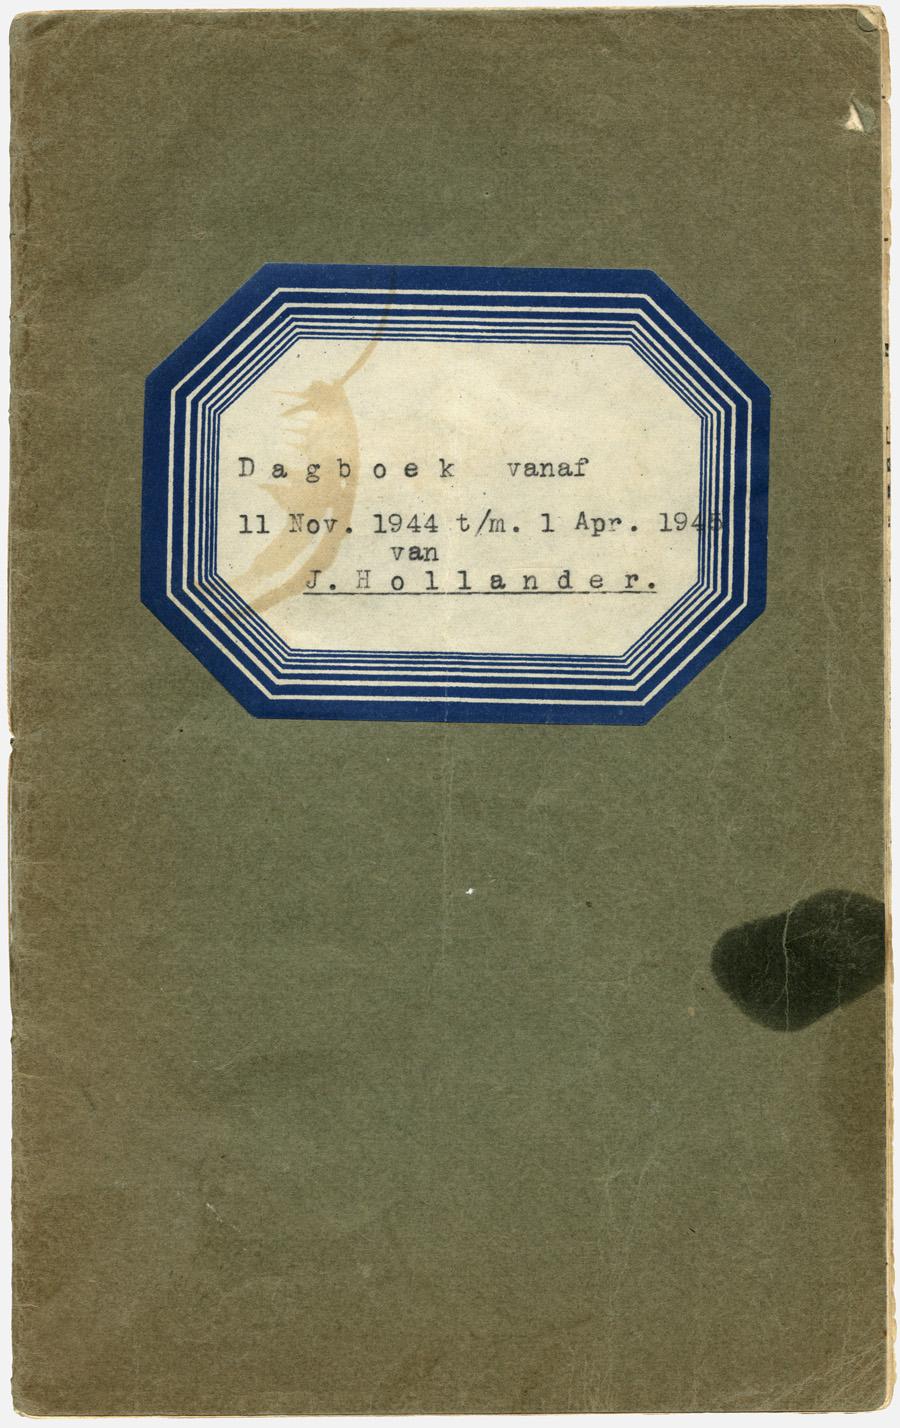 Dagboek J. Hollander